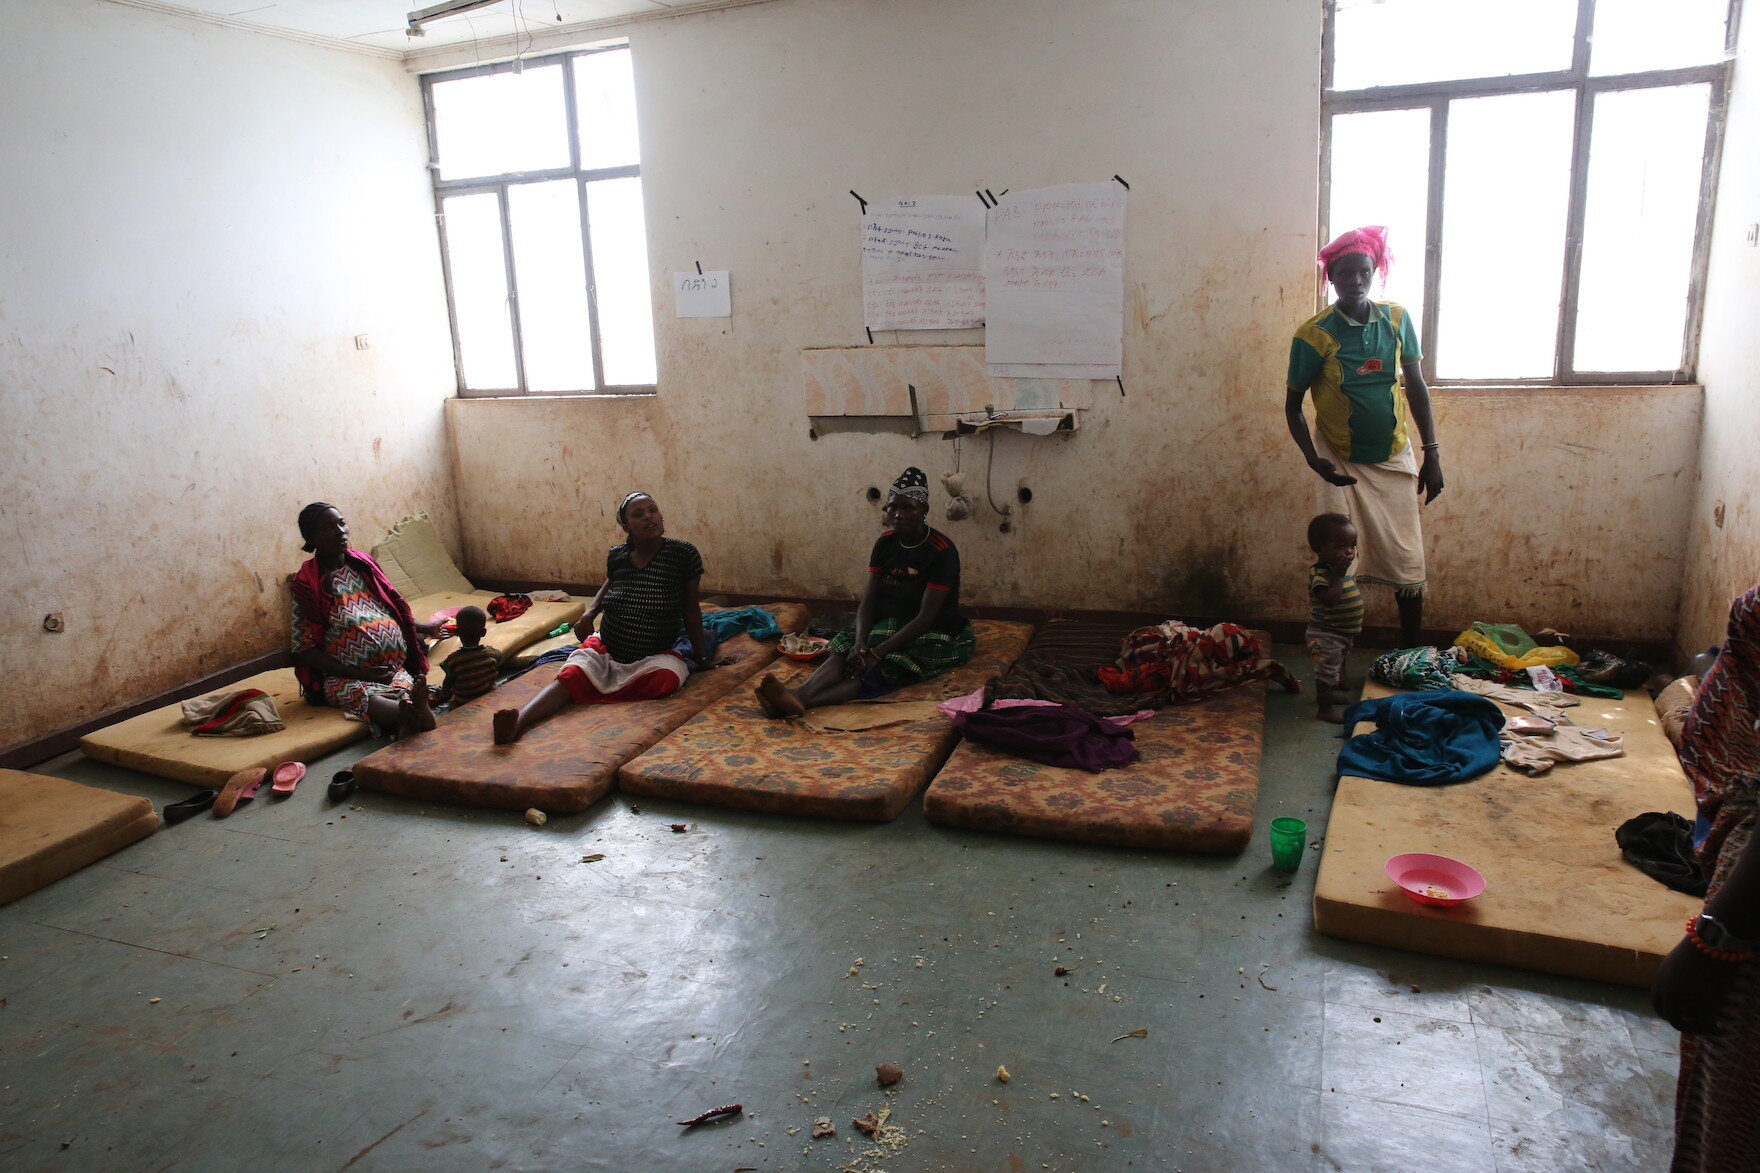 Maternity waiting area in rural Ethiopia. Courtesy: Village Health Partnership. PHOTO CREDIT:  Haik Kocharian